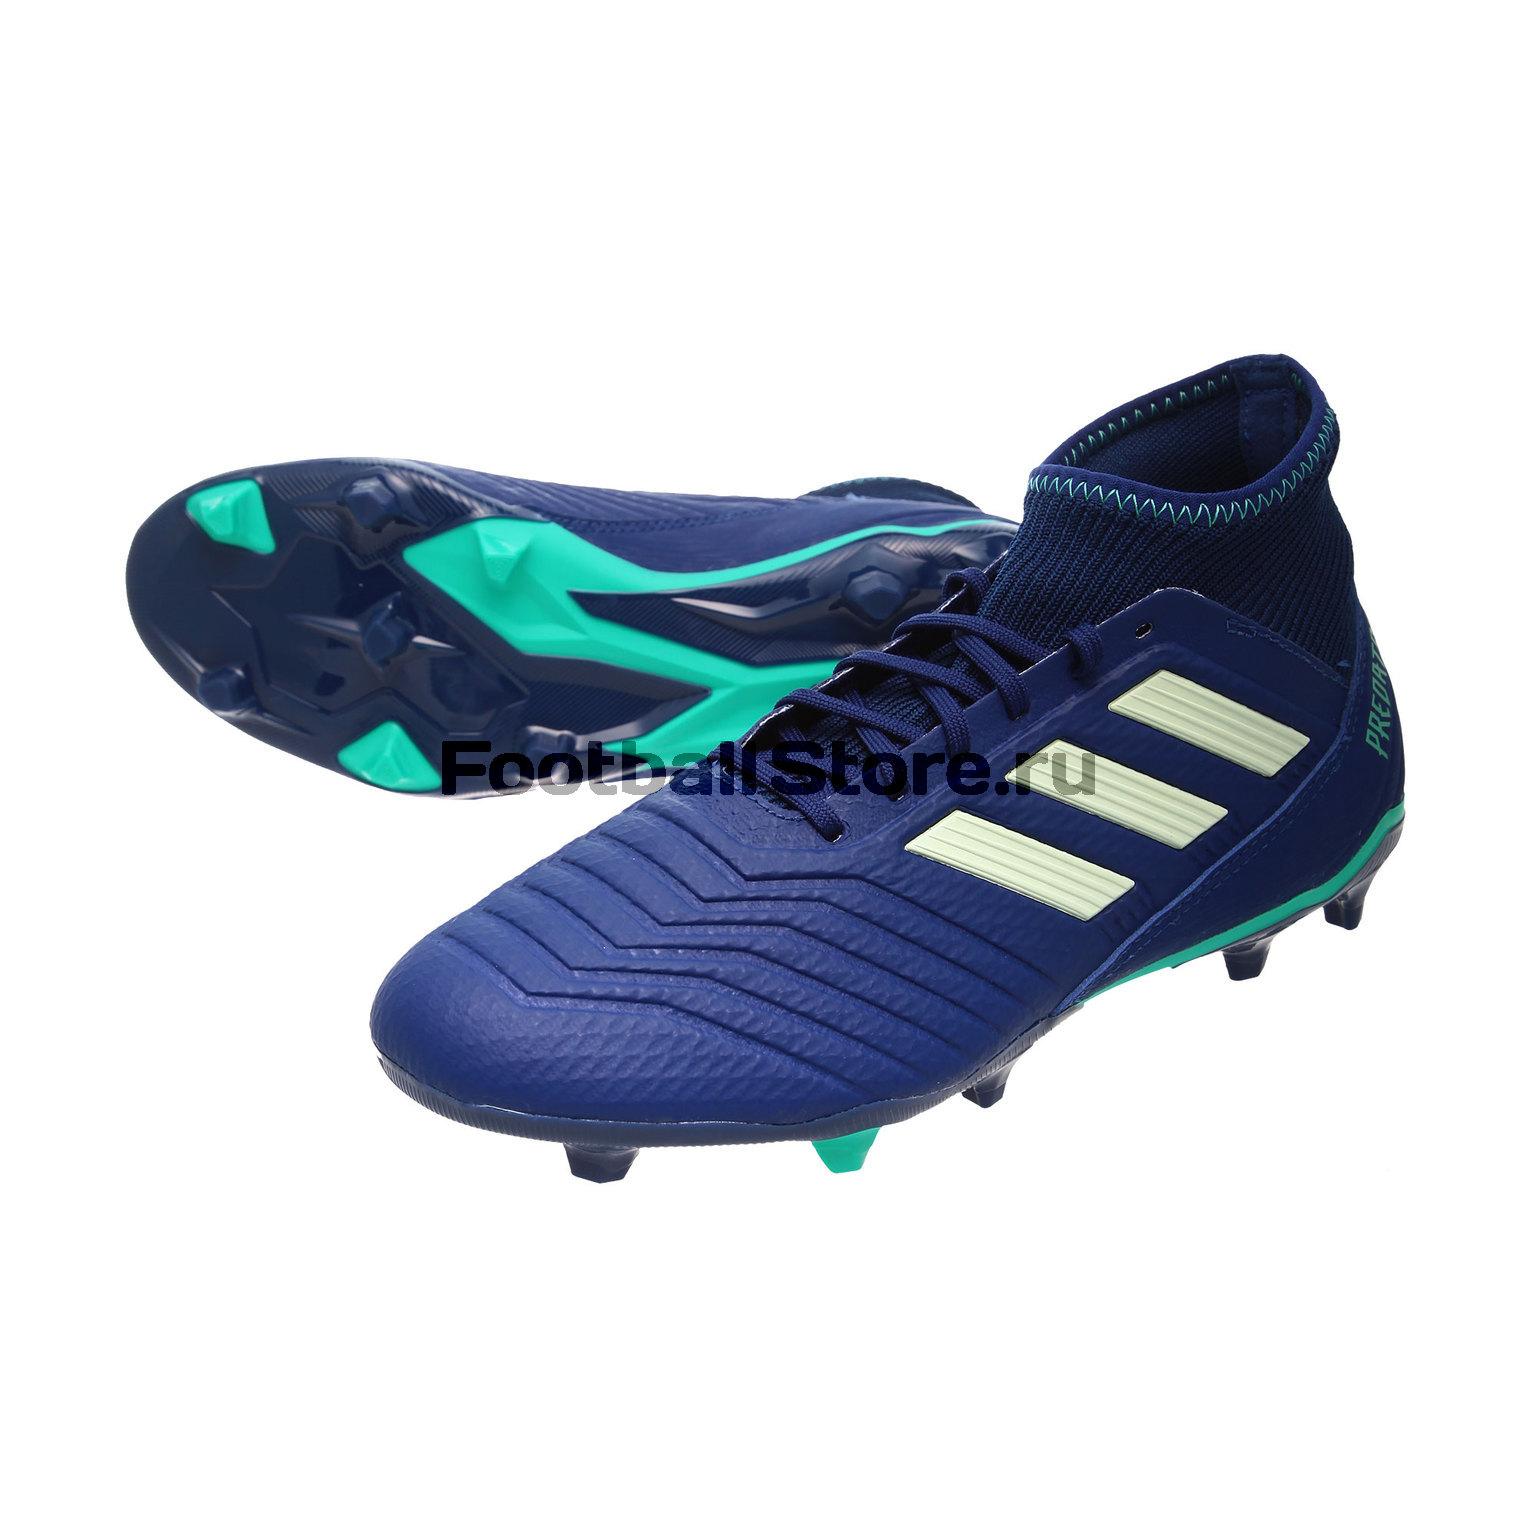 Бутсы Adidas Predator 18.3 FG CP9304 adidas predator junior gk glove